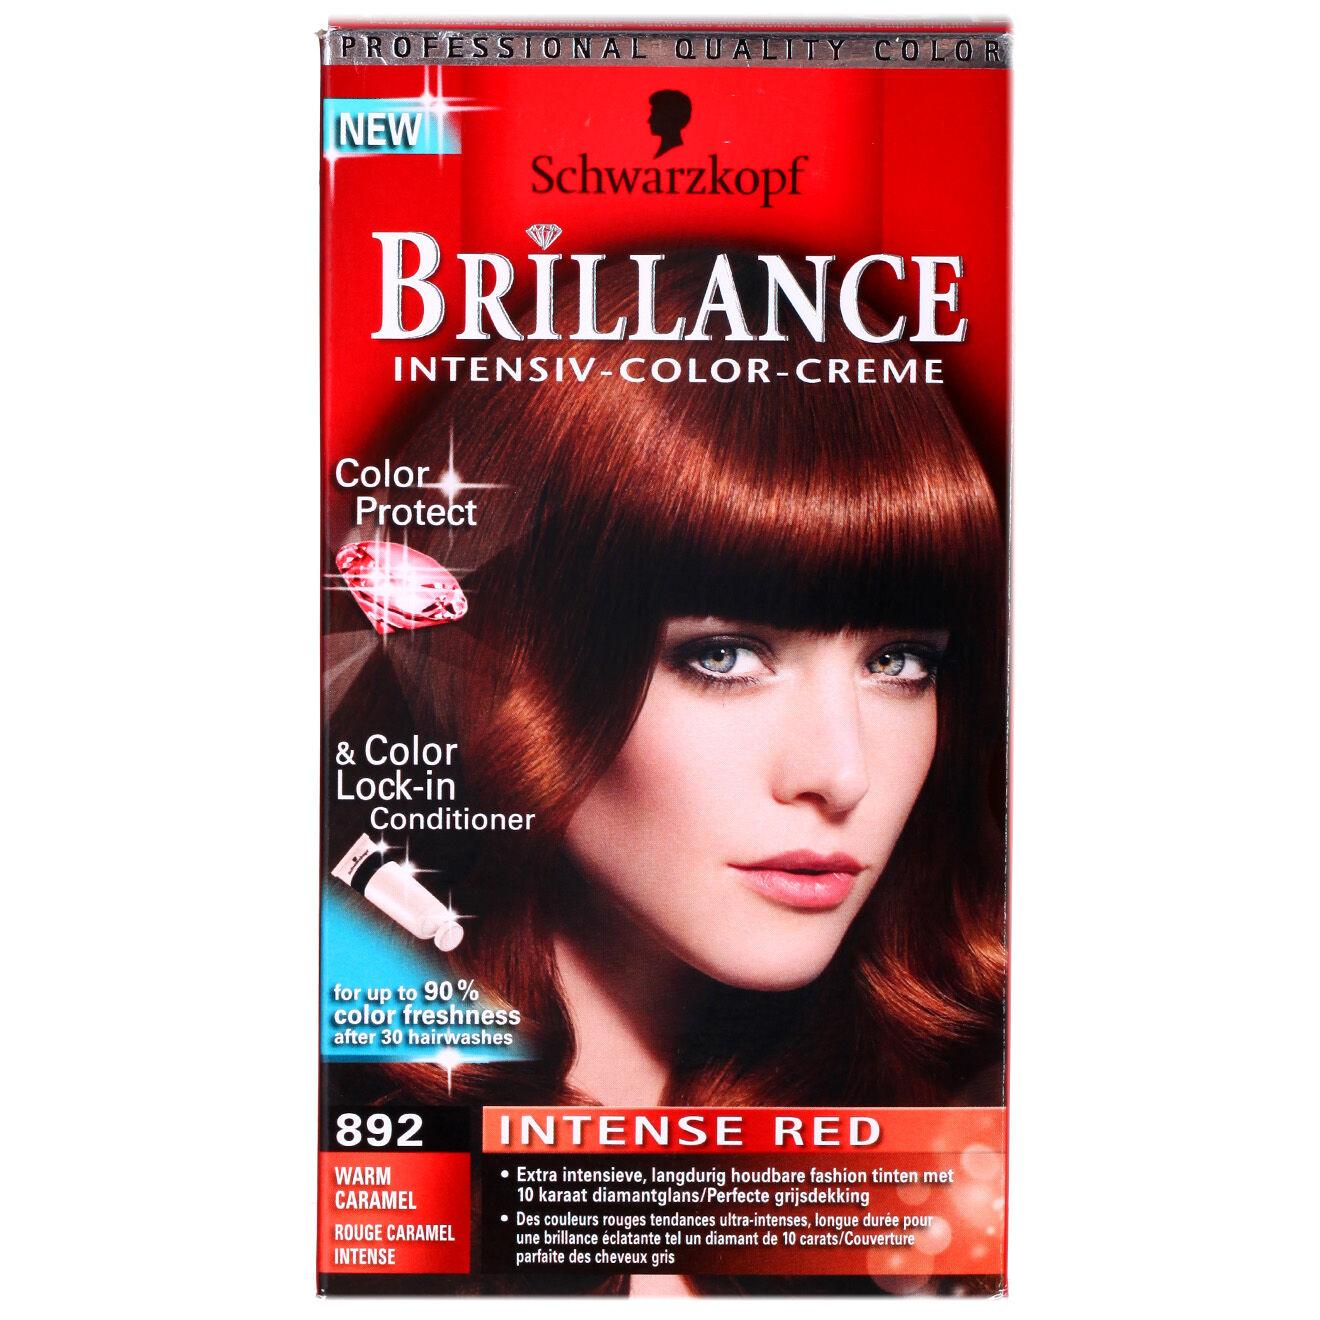 Coloration Brillance 892 rouge caremel intense